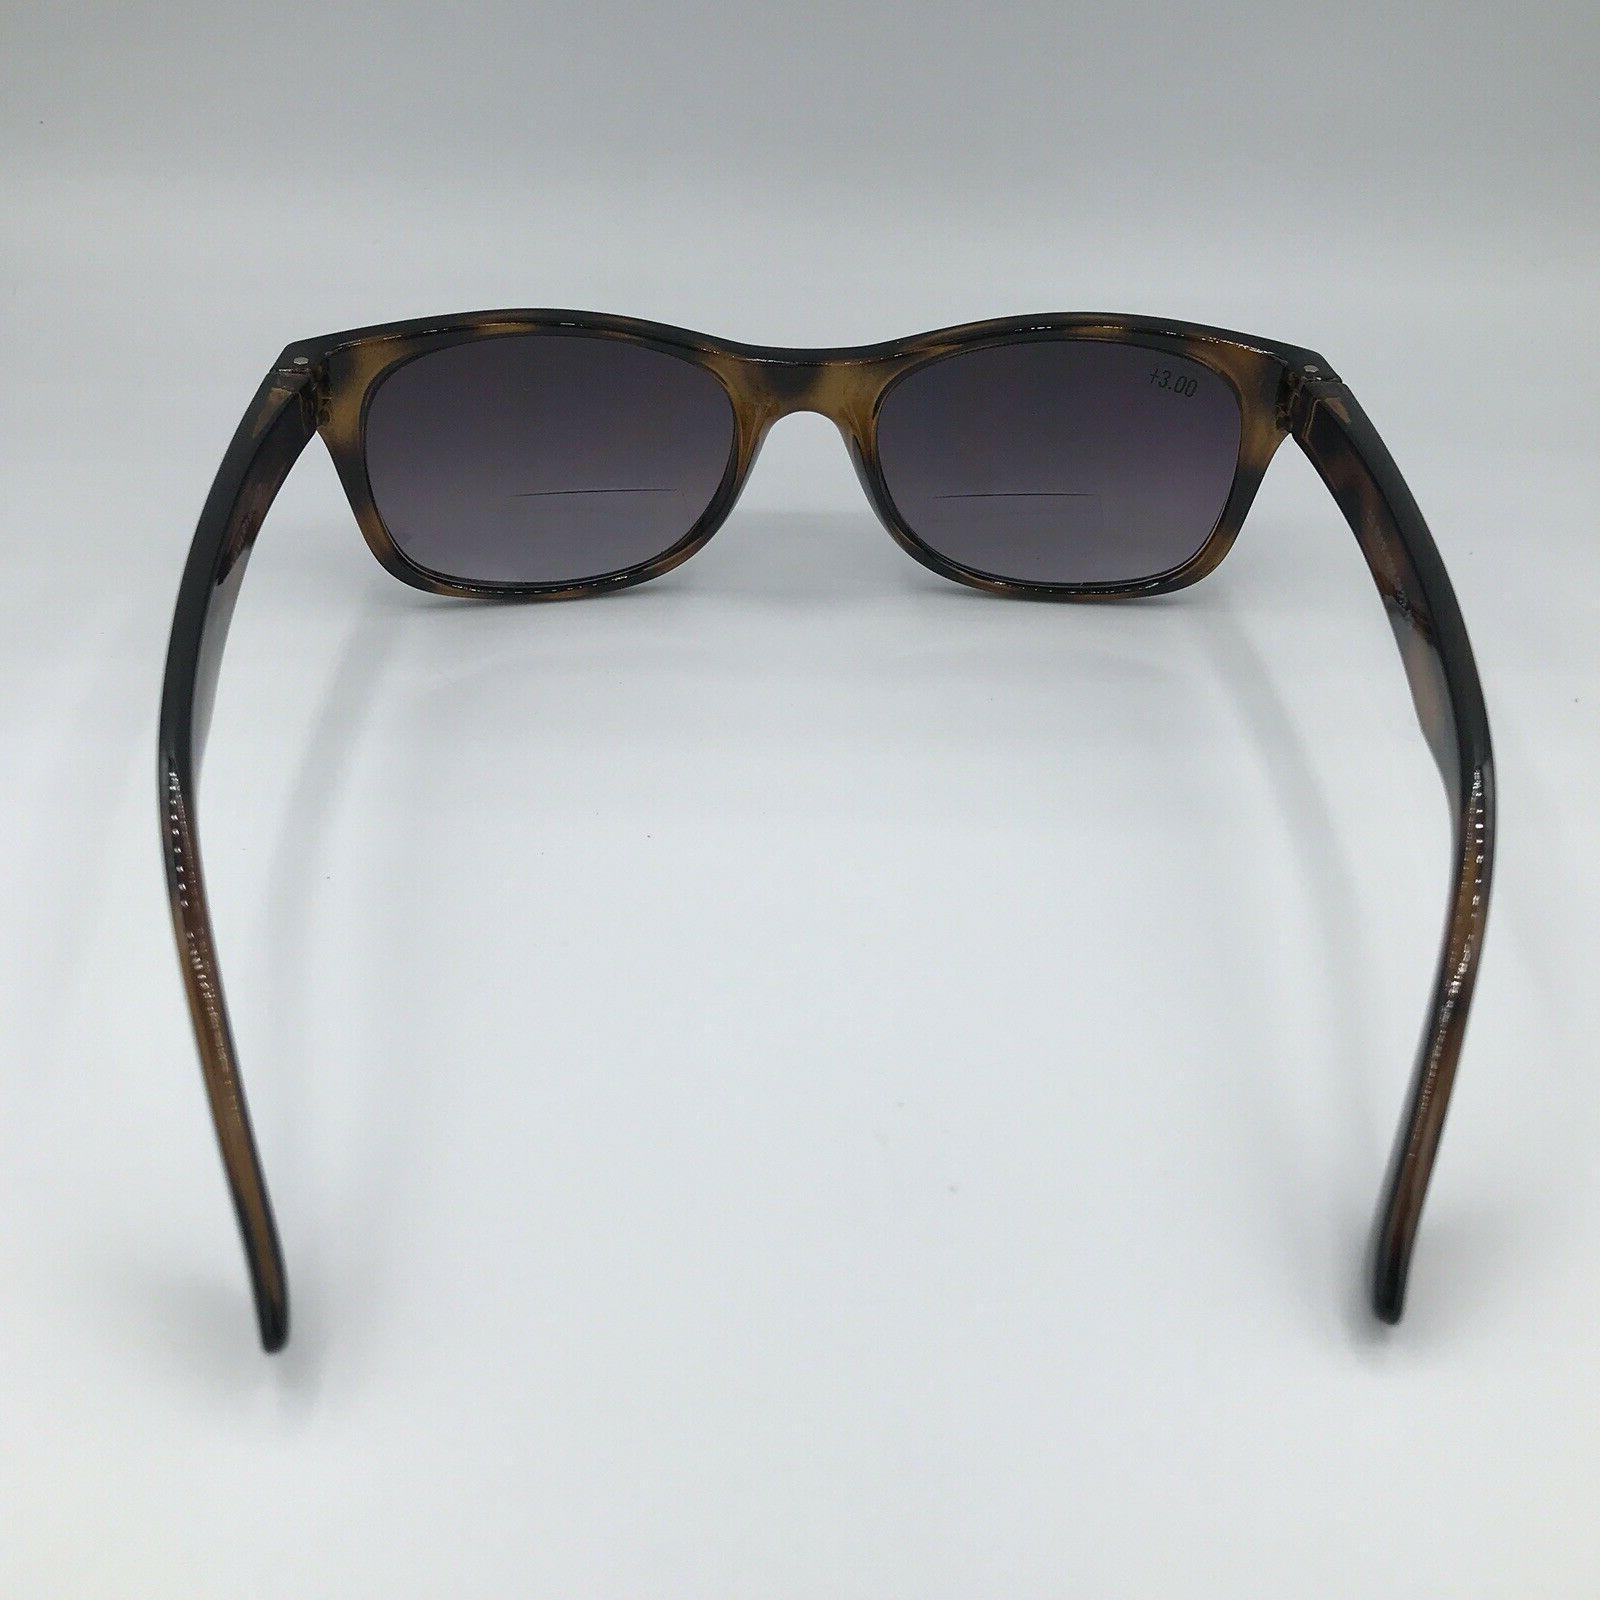 Gamma Ray Optics Sunglasses Tortoise Shell Outdoor